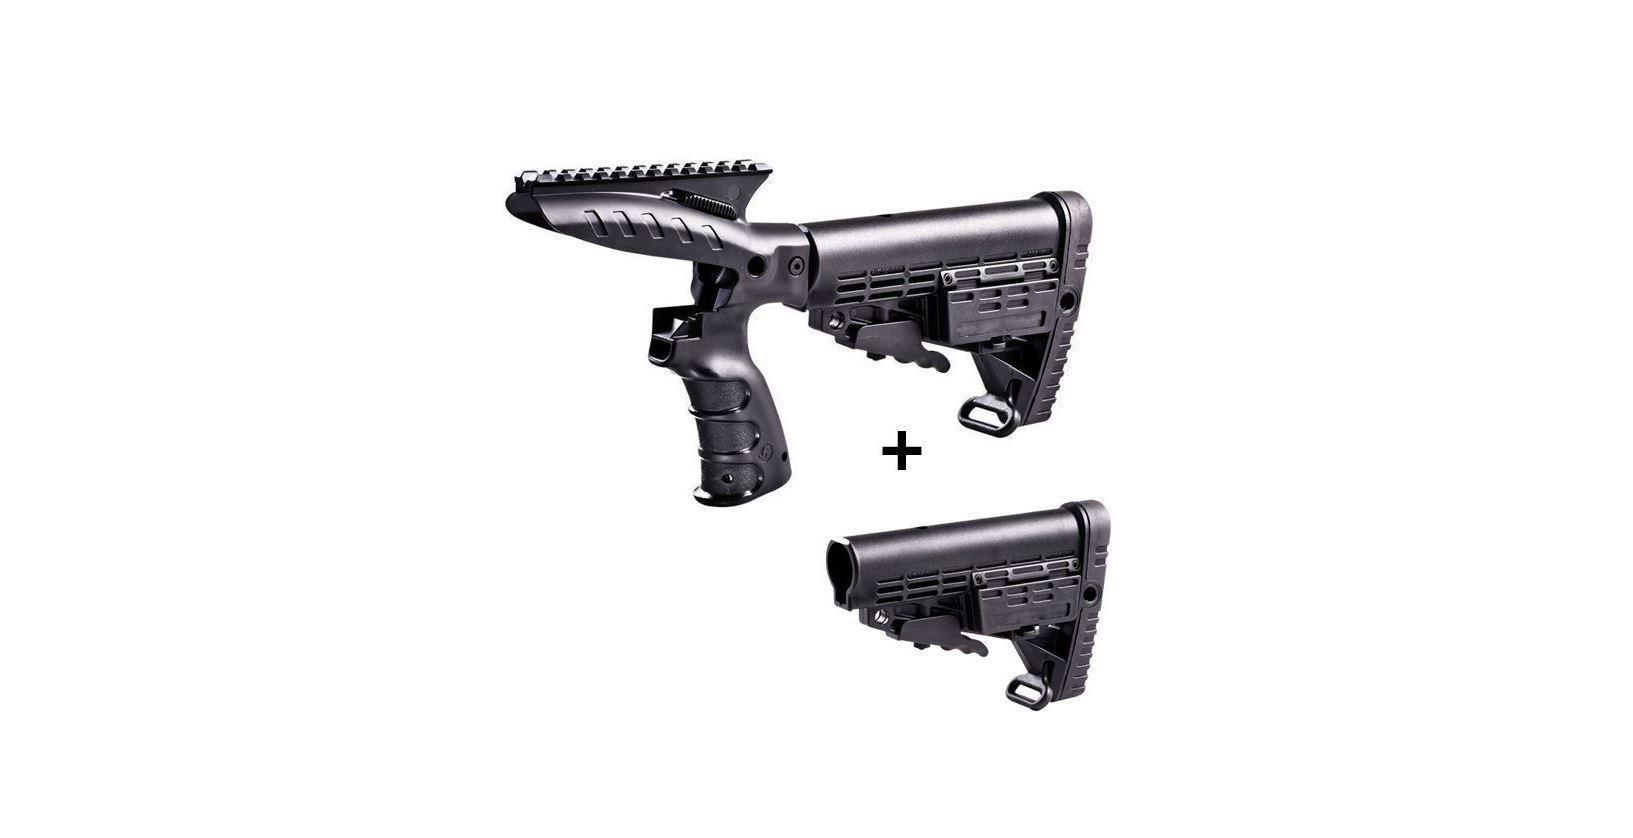 CMGPAT500   Mossberg 500/590 Collapsible Stock & Pistol Grip